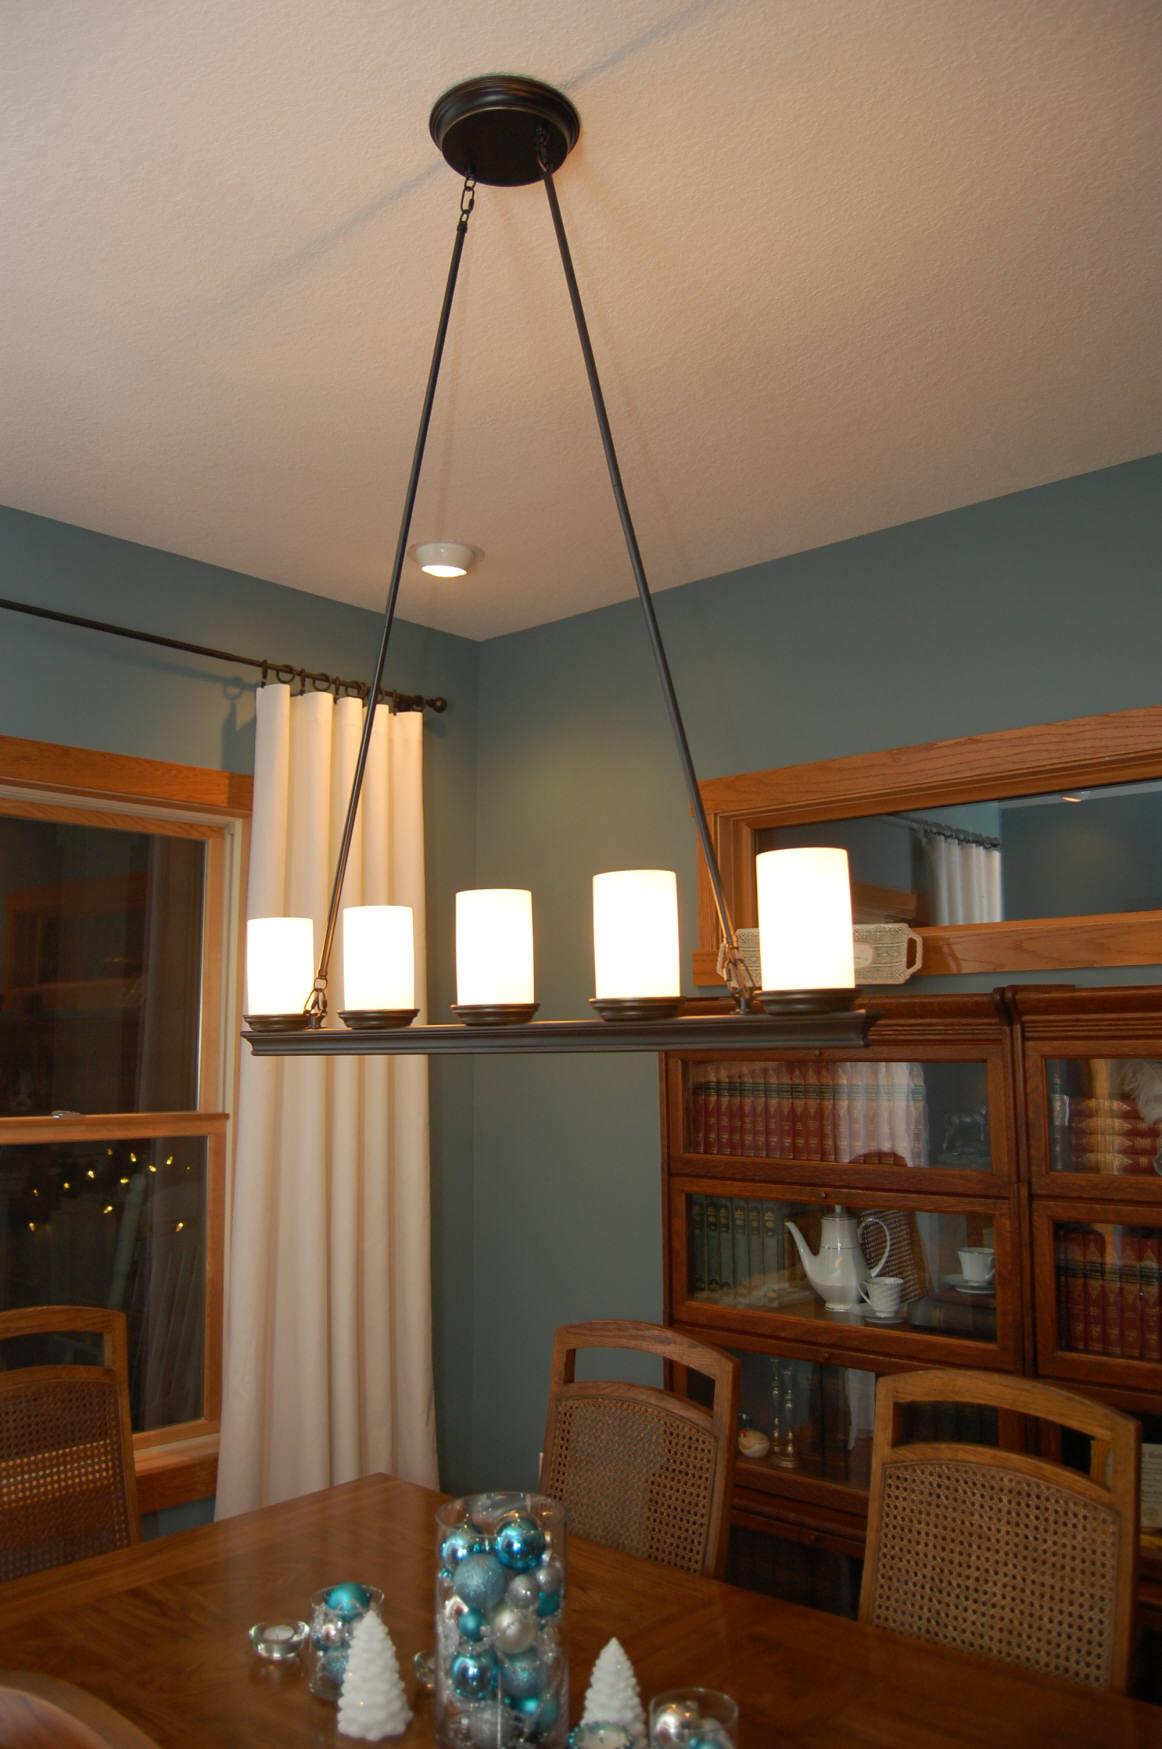 Dining room ceiling lighting inspiring well best dining room ceiling